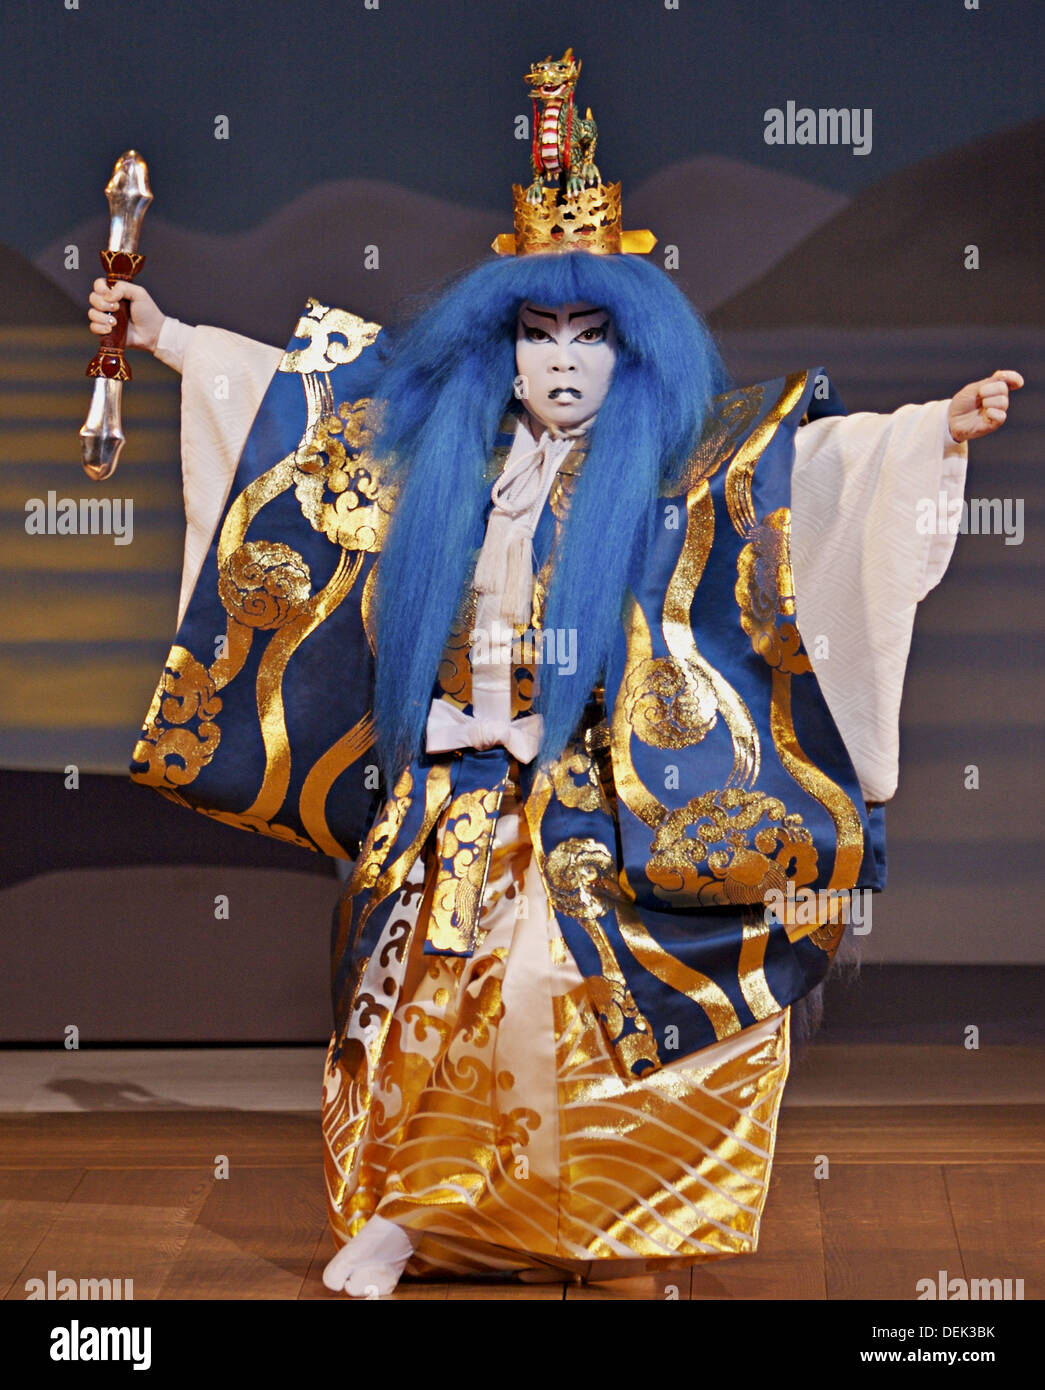 Geisha in miyako japan